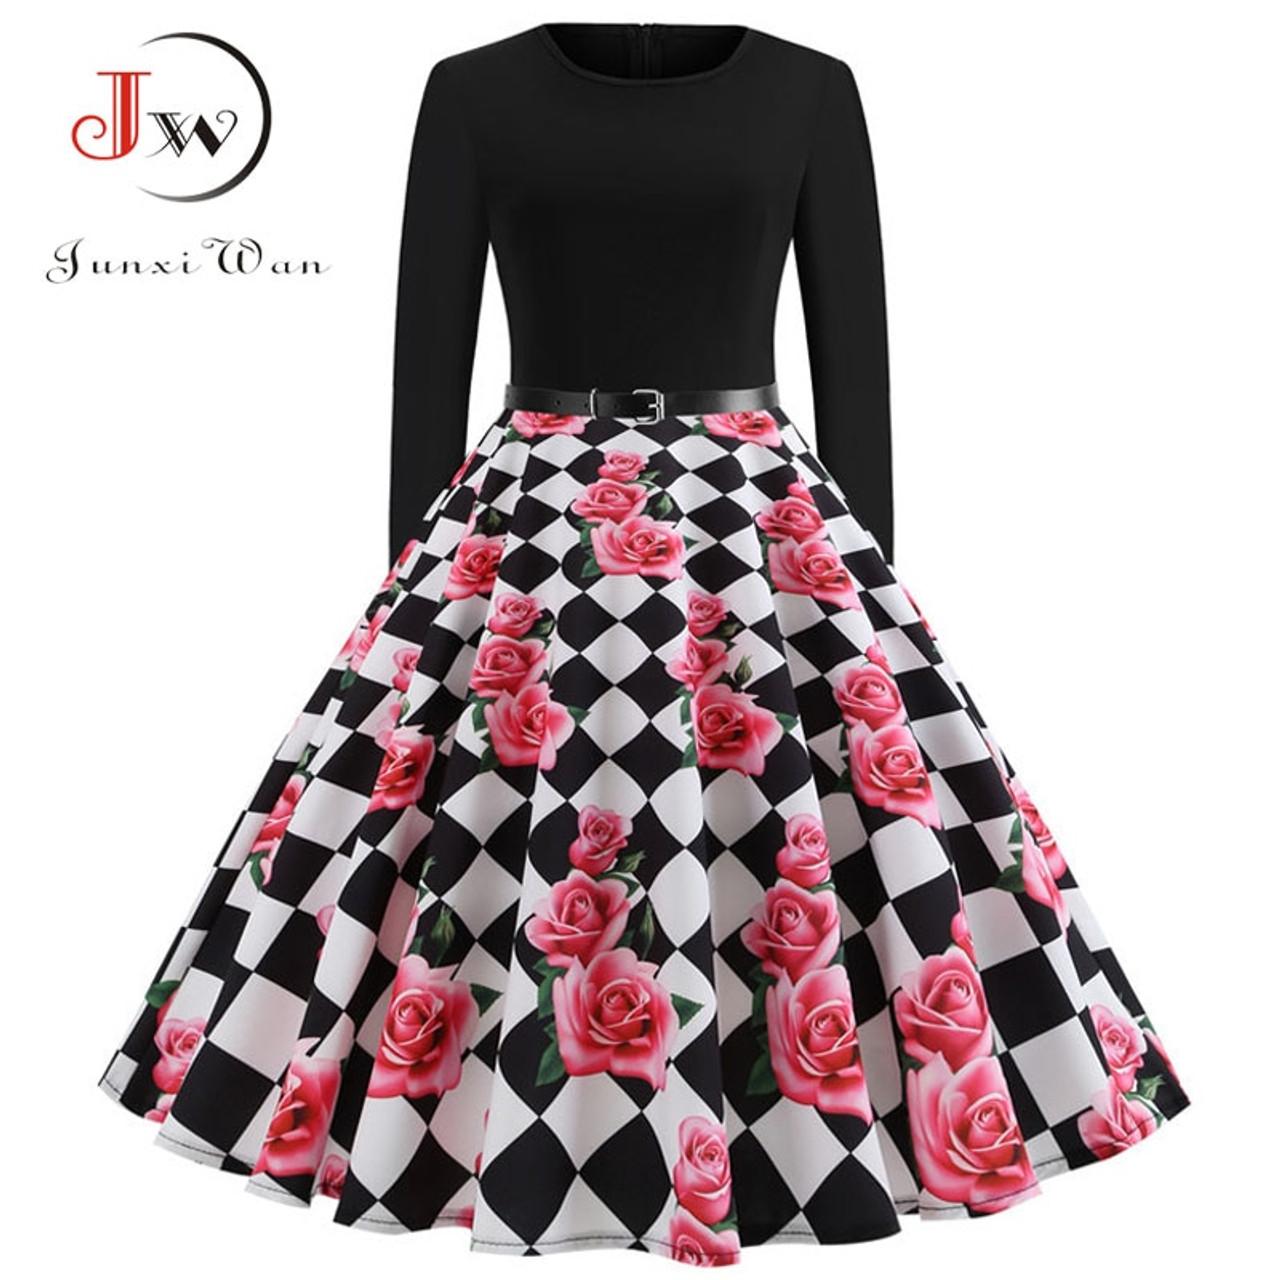 6835b1e87fa ... Black Winter Dress Women Polka Dot Patchwork Elegant Vintage Dress Long  Sleeve Big Swing Plus Size ...